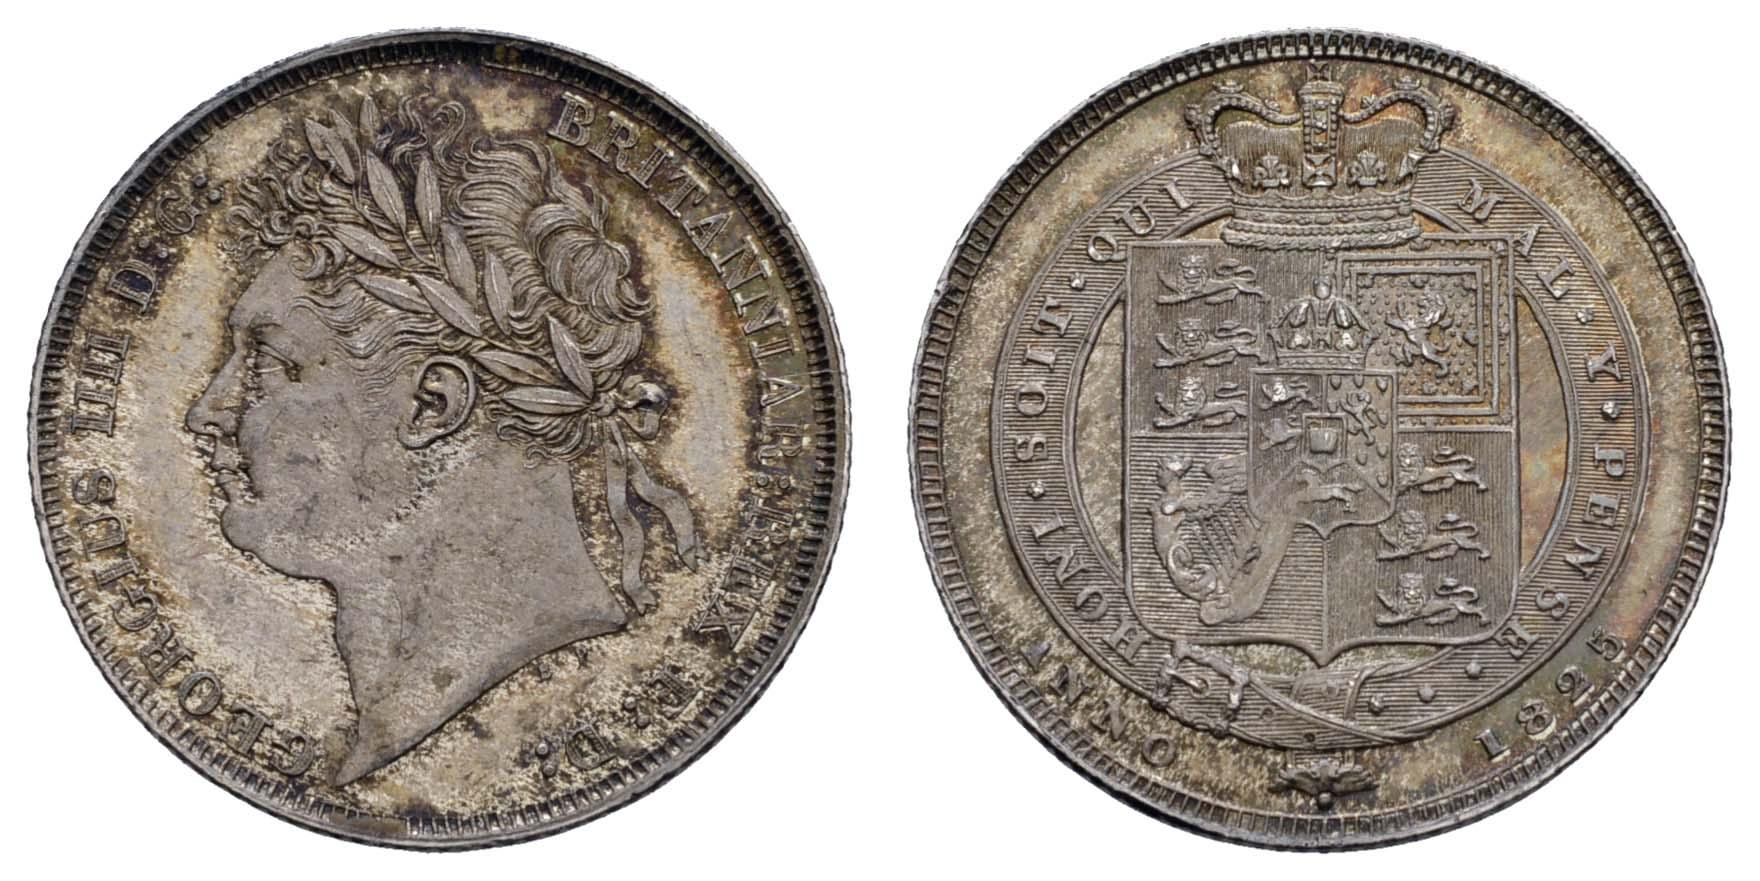 Lot 1566 - europa ab 1800 - Großbritannien -  Auktionshaus Ulrich Felzmann GmbH & Co. KG Coins single lots